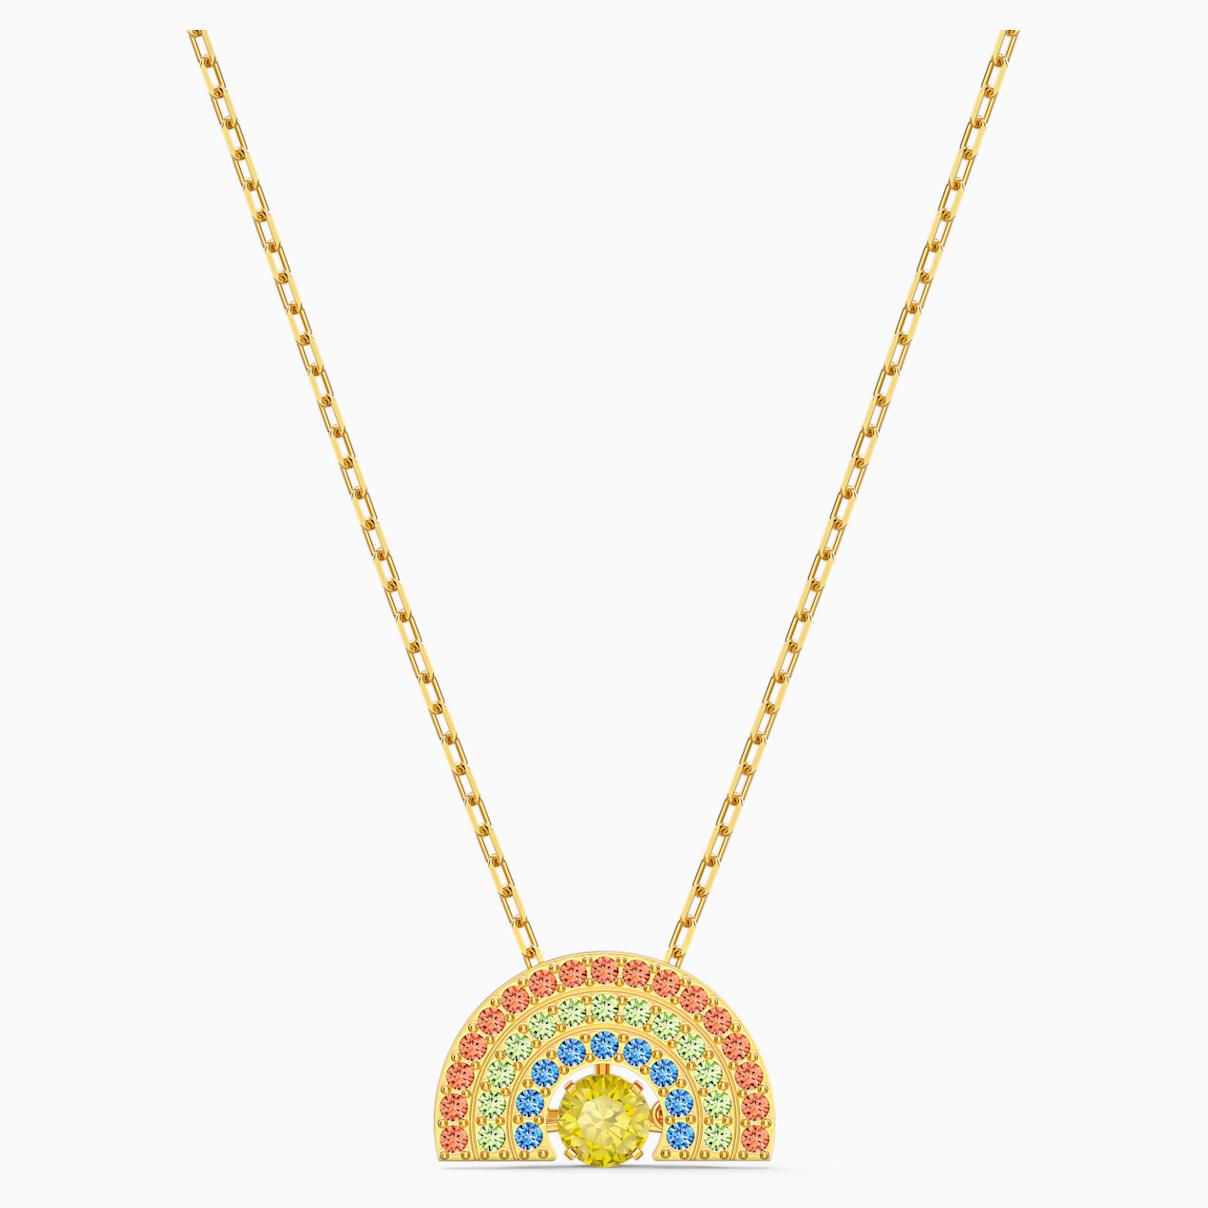 Swarovski Sparkling Dance Rainbow Necklace, Light multi-colored, Gold-tone plated